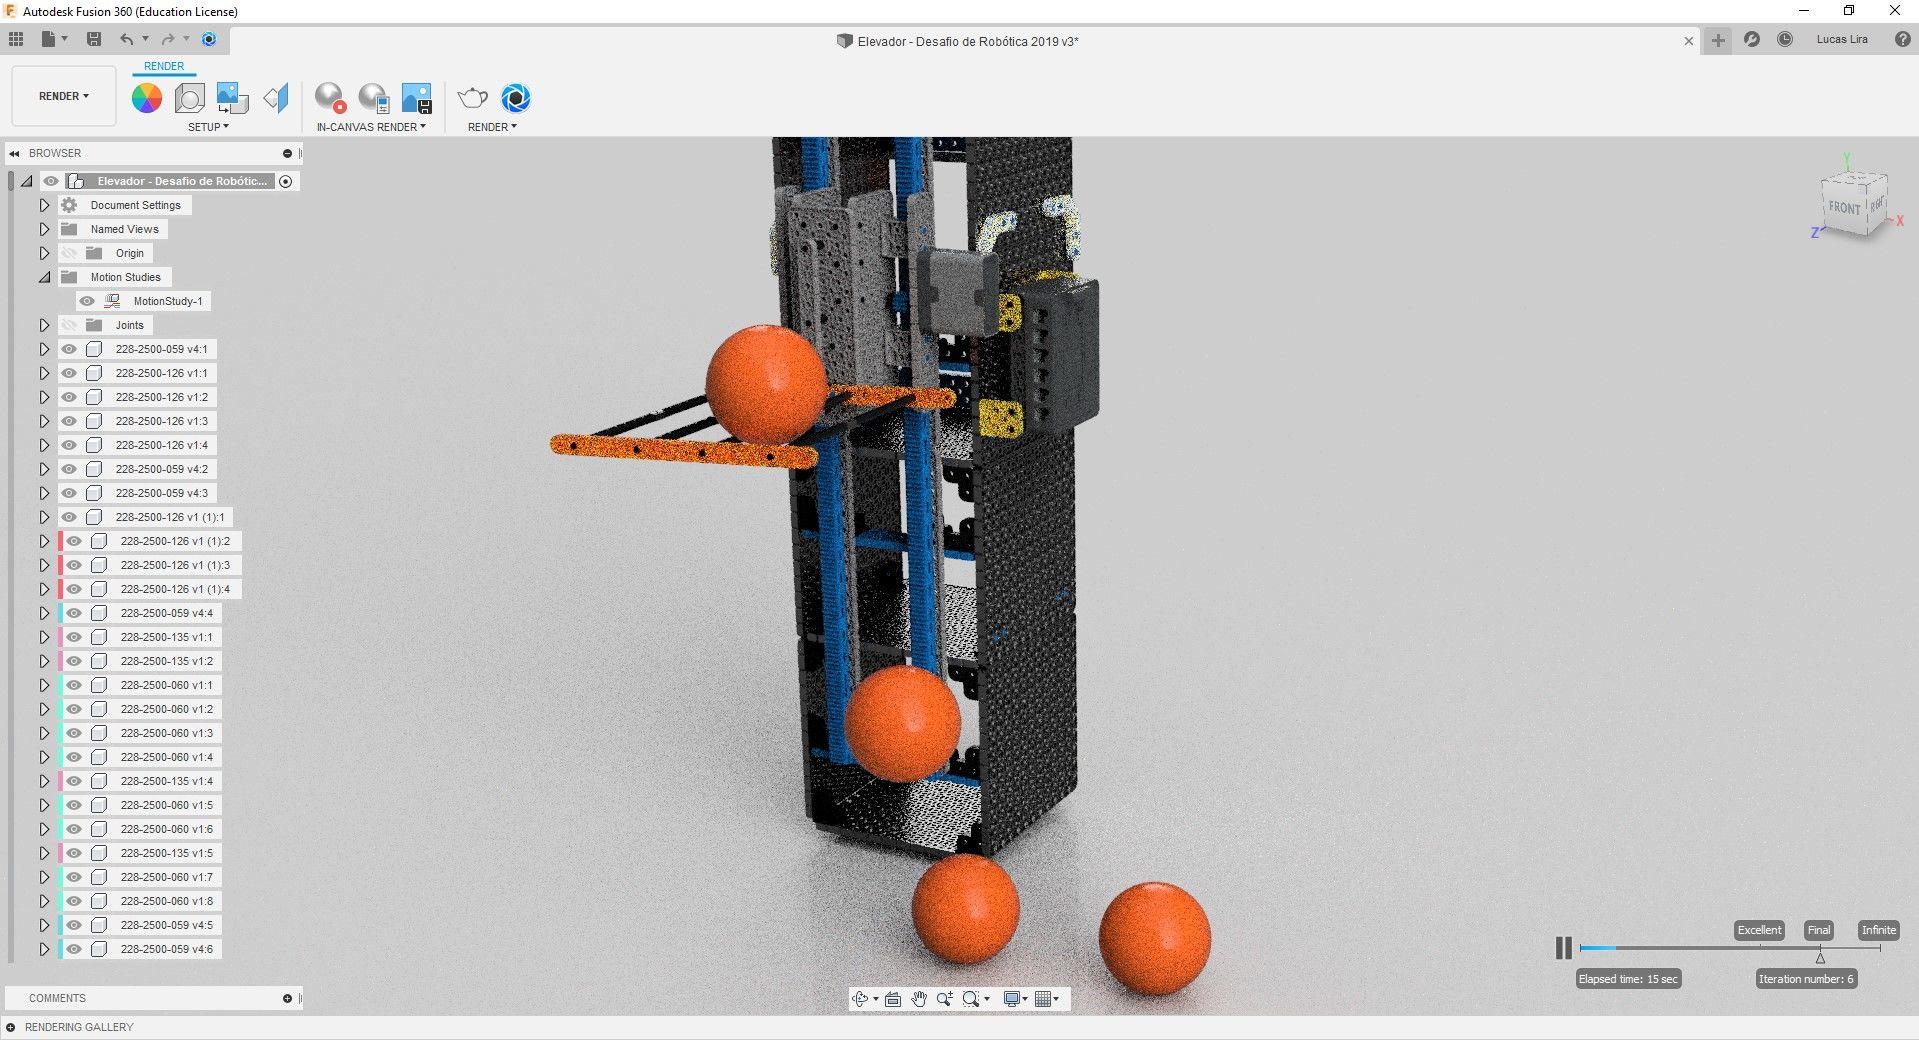 Robot-fab-3500-3500